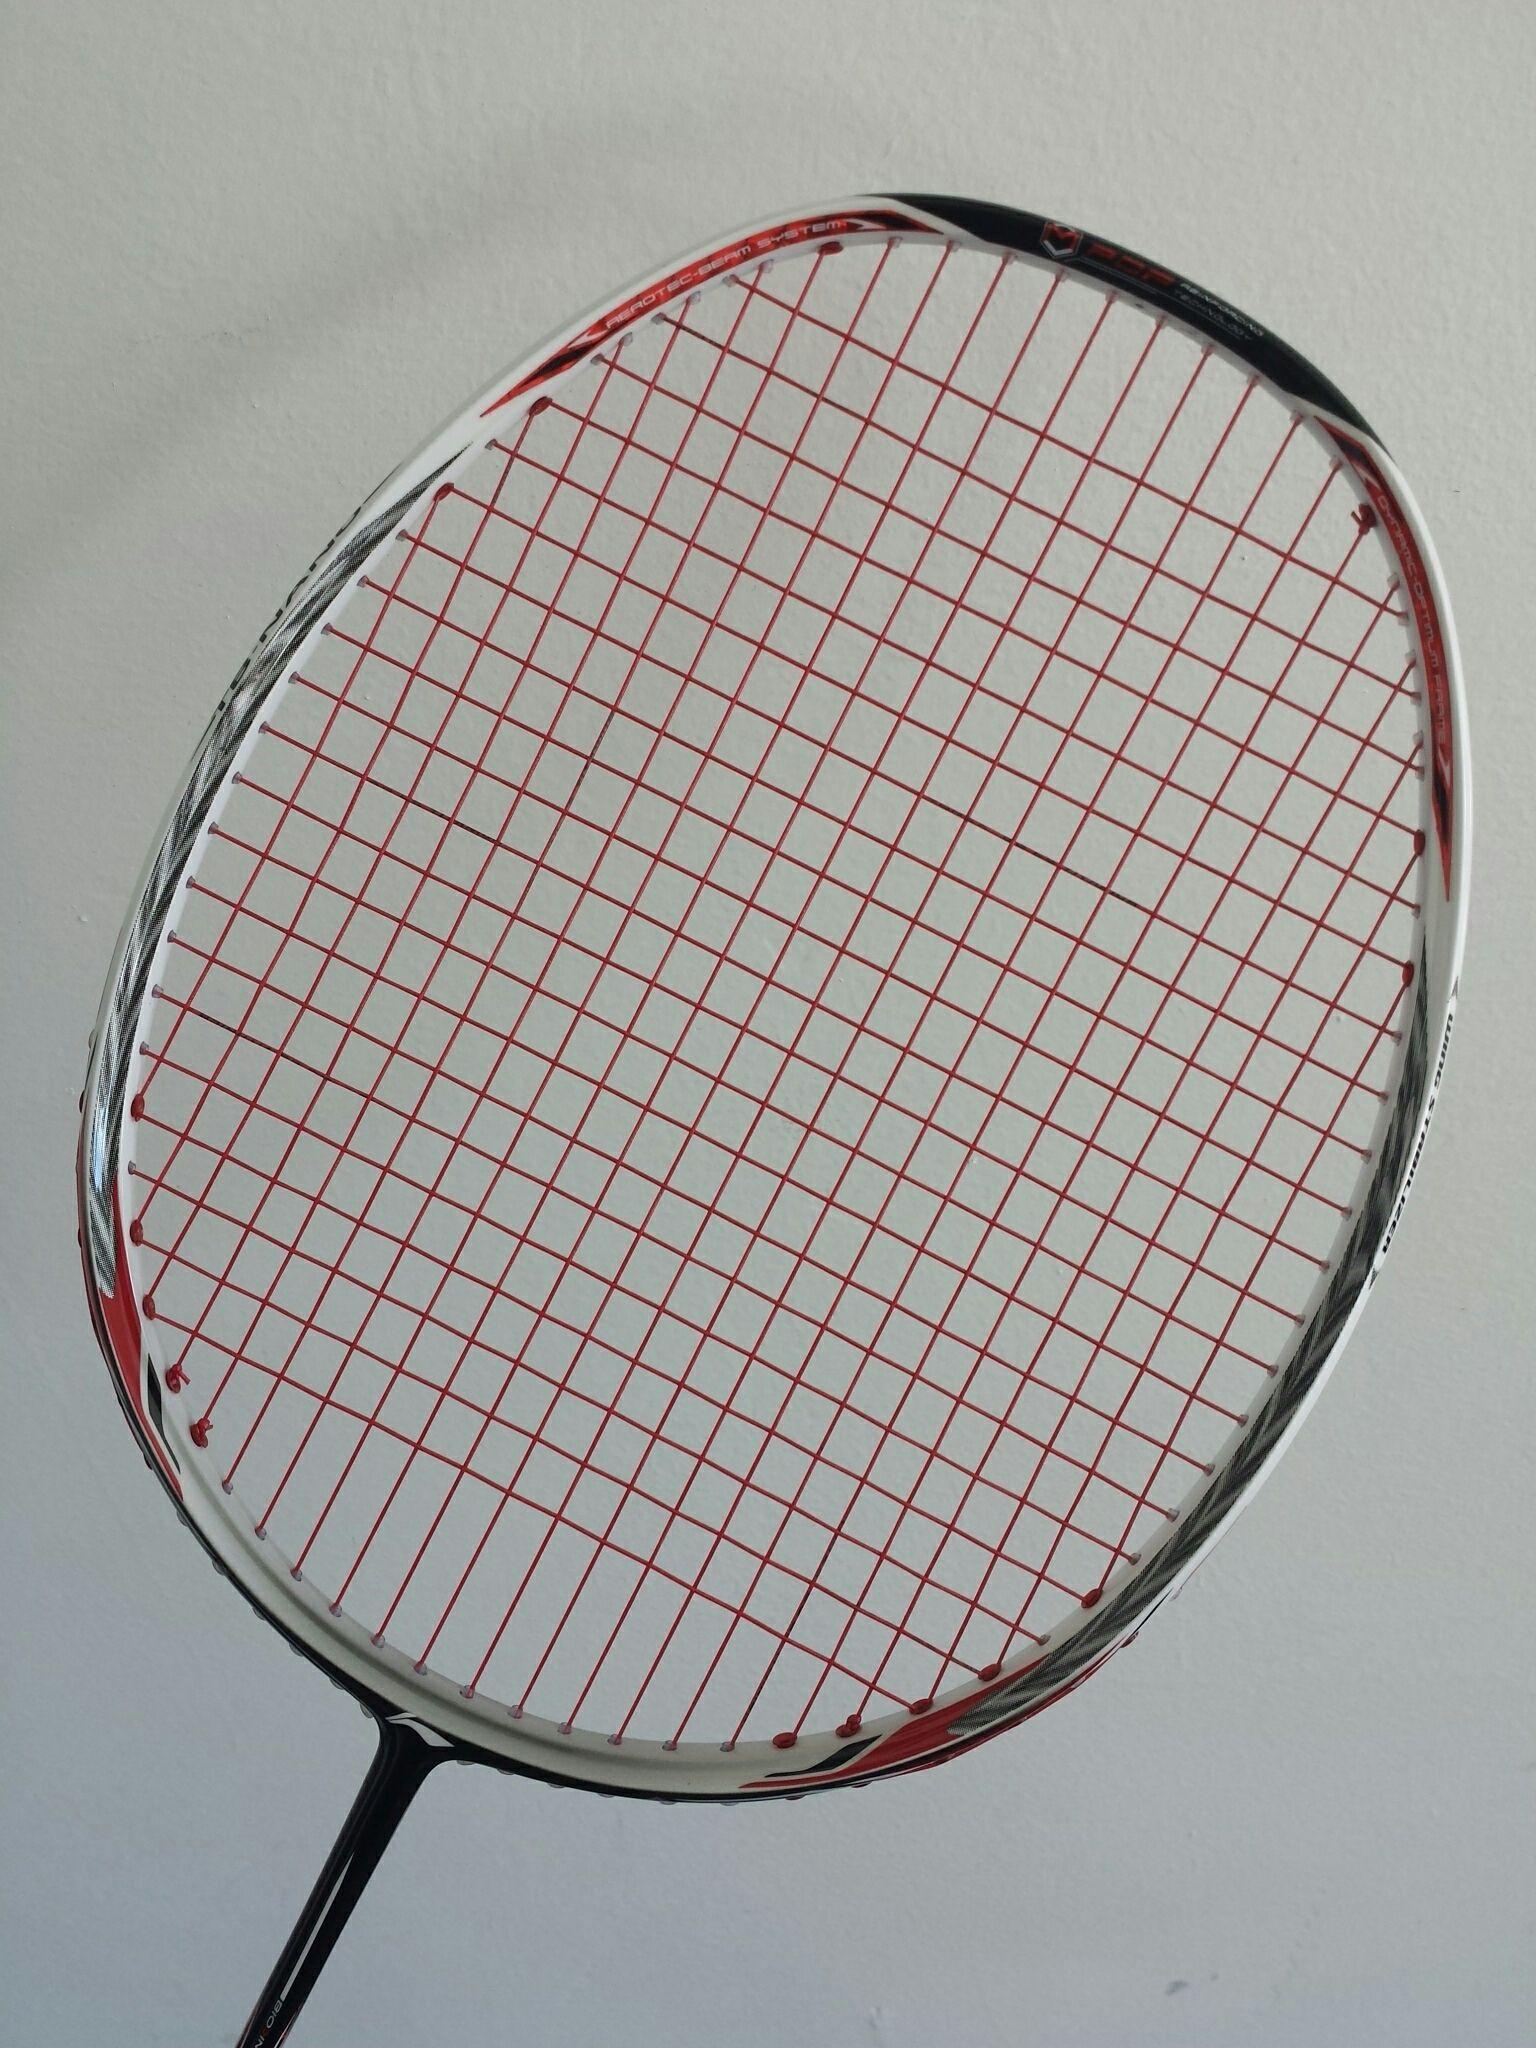 Pin On Badminton Racket Gallery